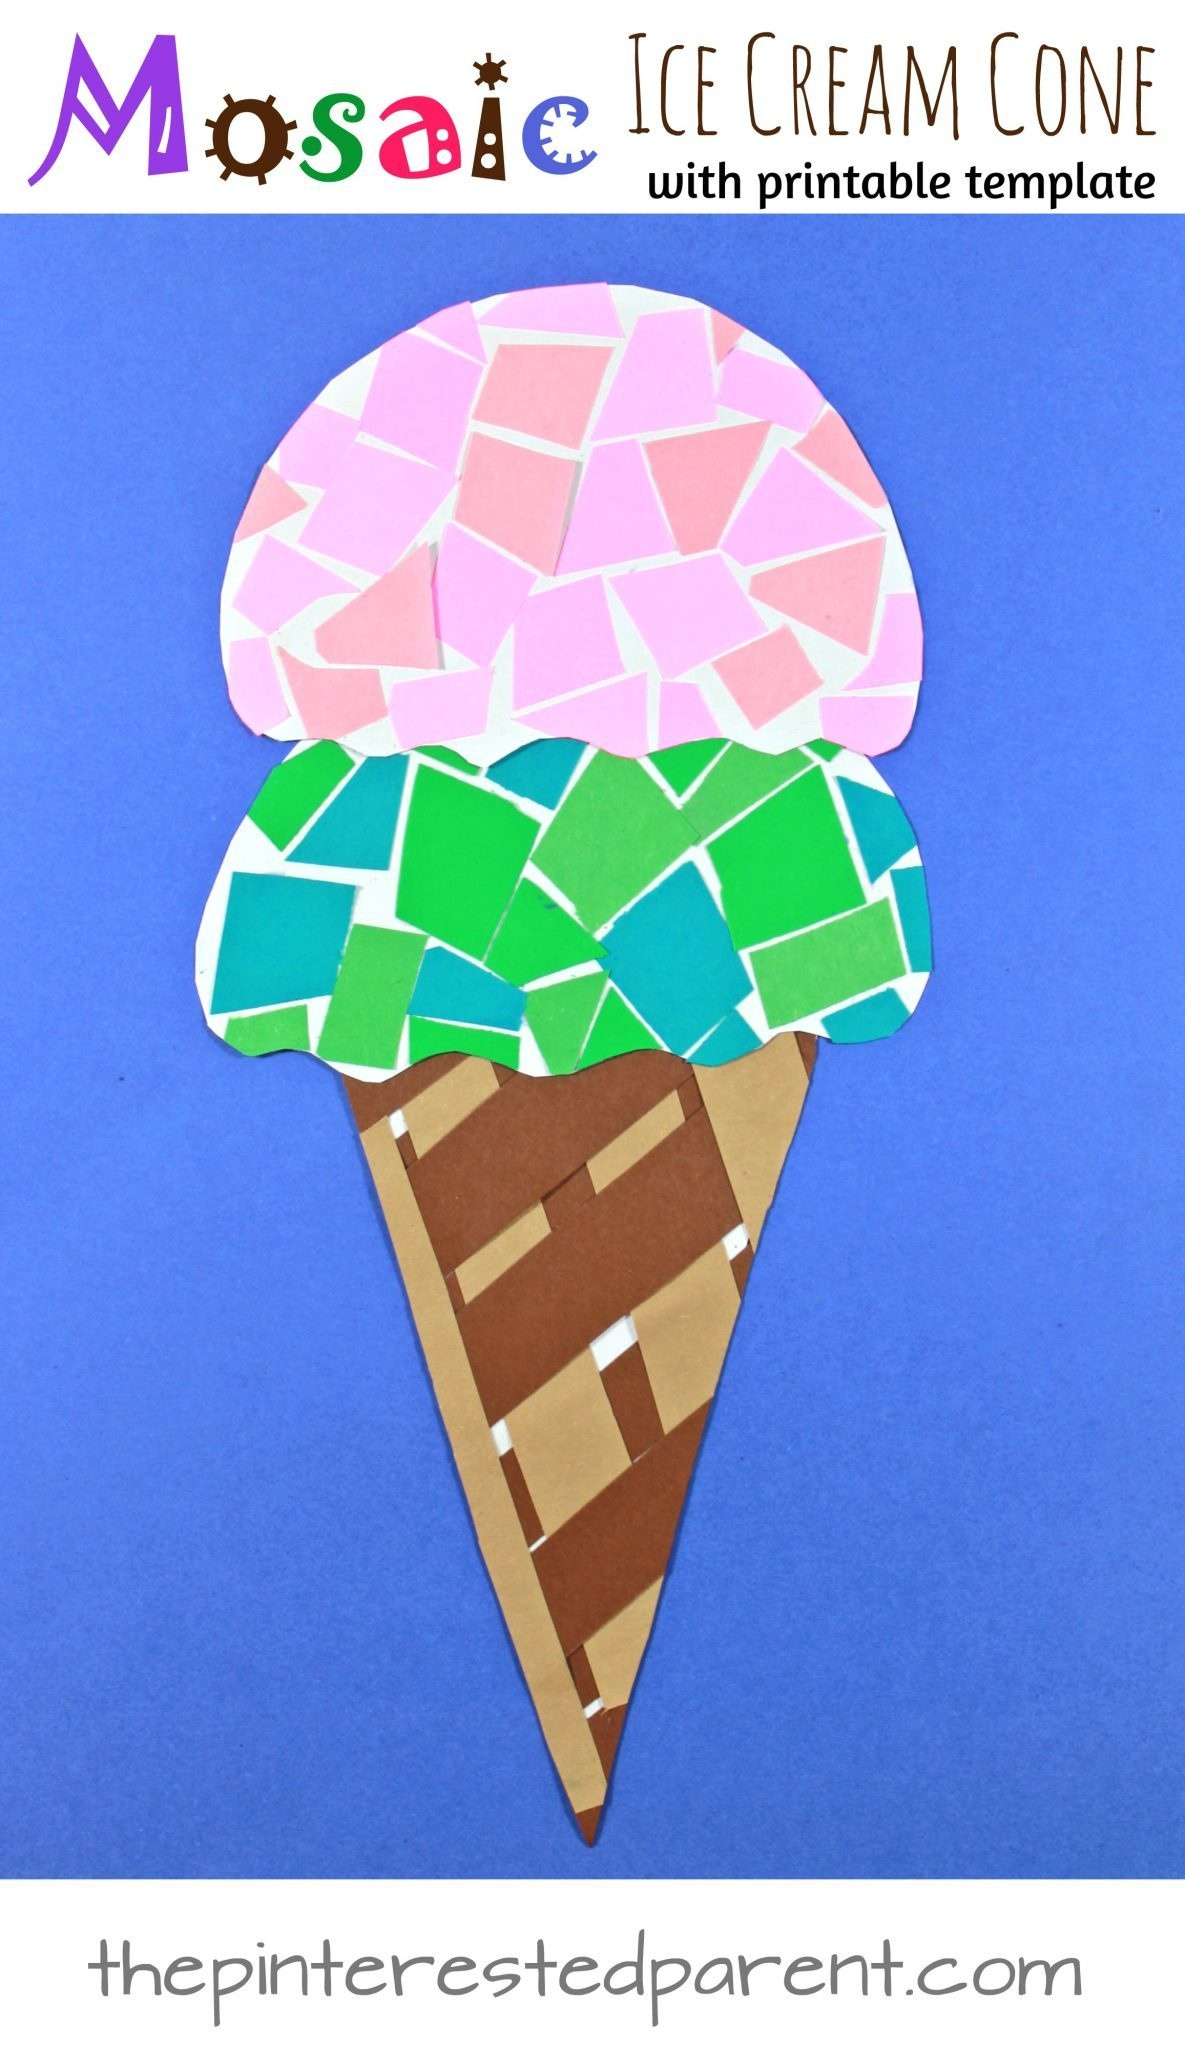 Ice Cream Cone Template Free Printable